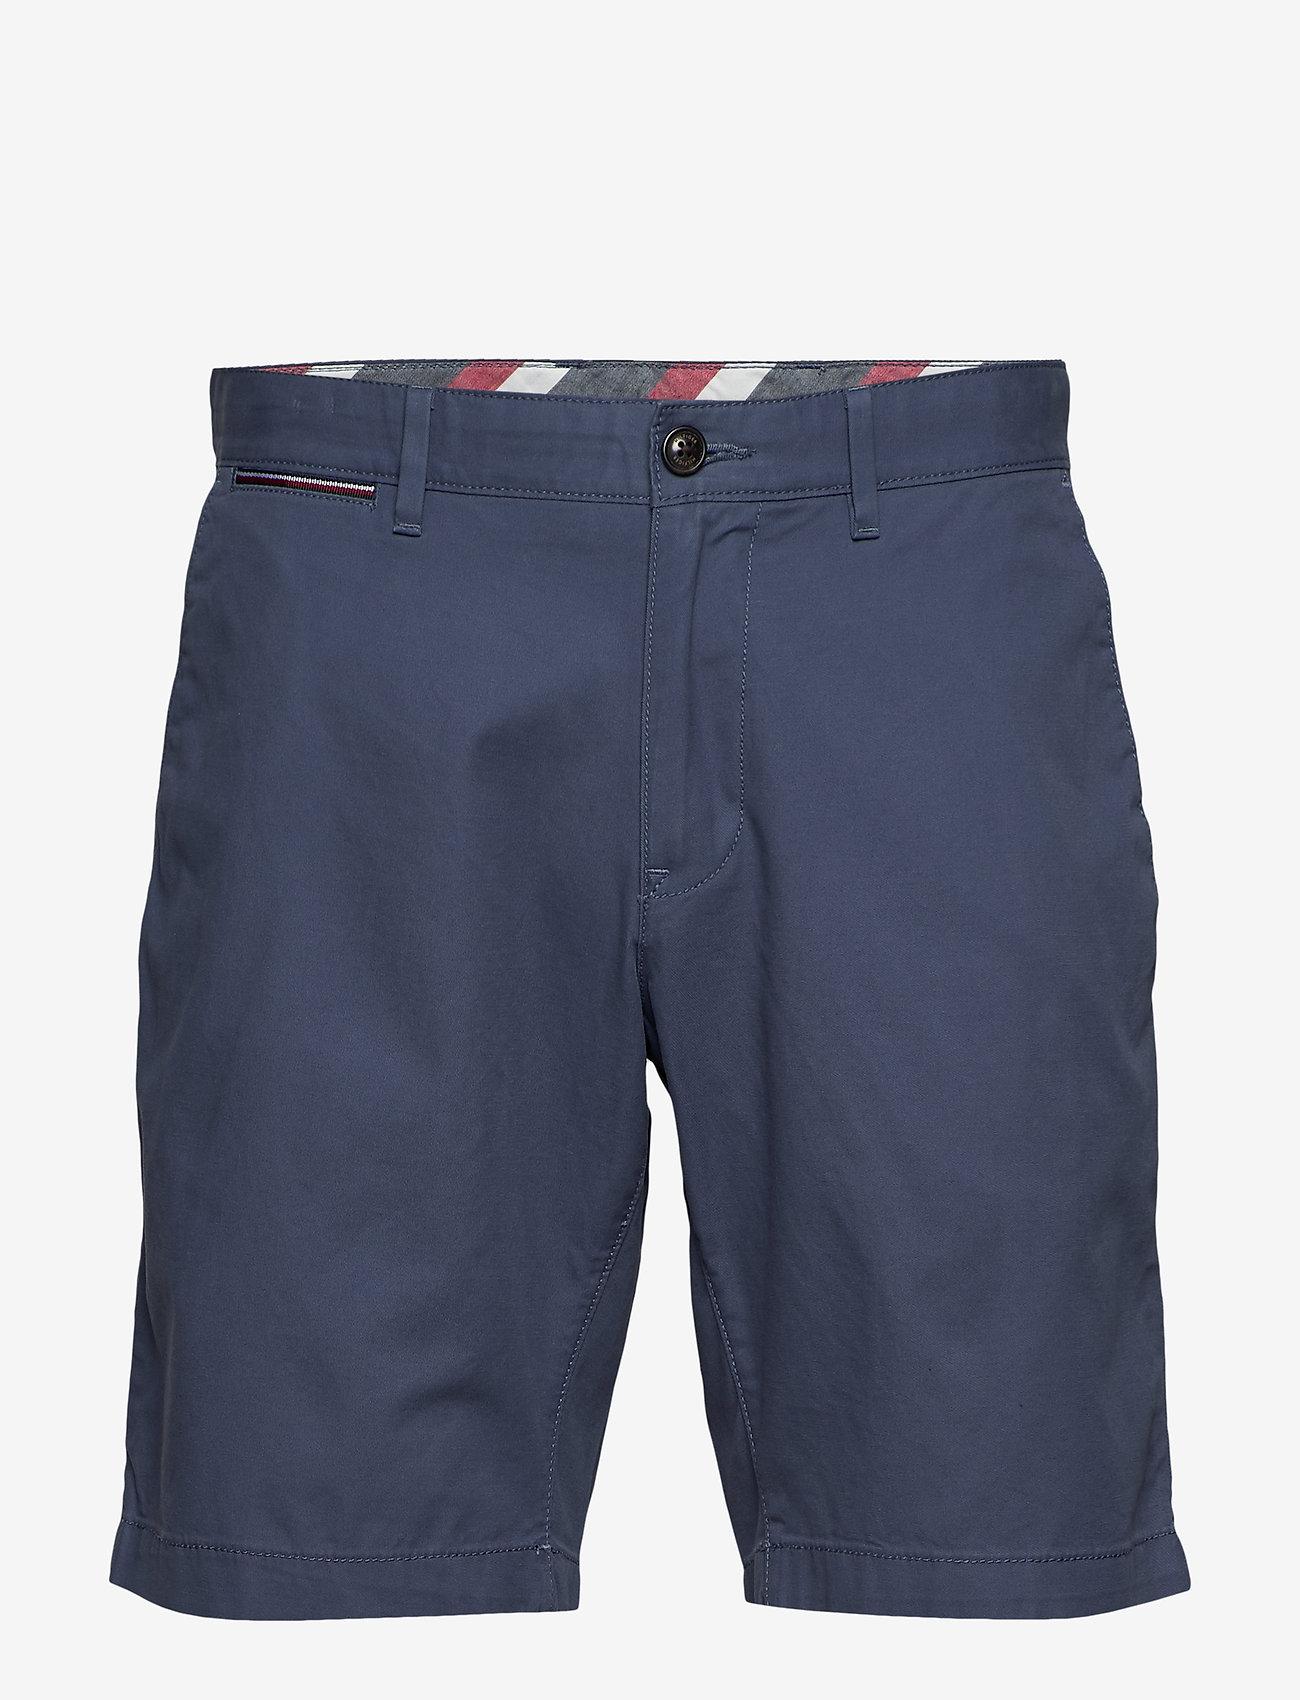 Tommy Hilfiger - BROOKLYN SHORT LIGHT TWILL - chinos shorts - faded indigo